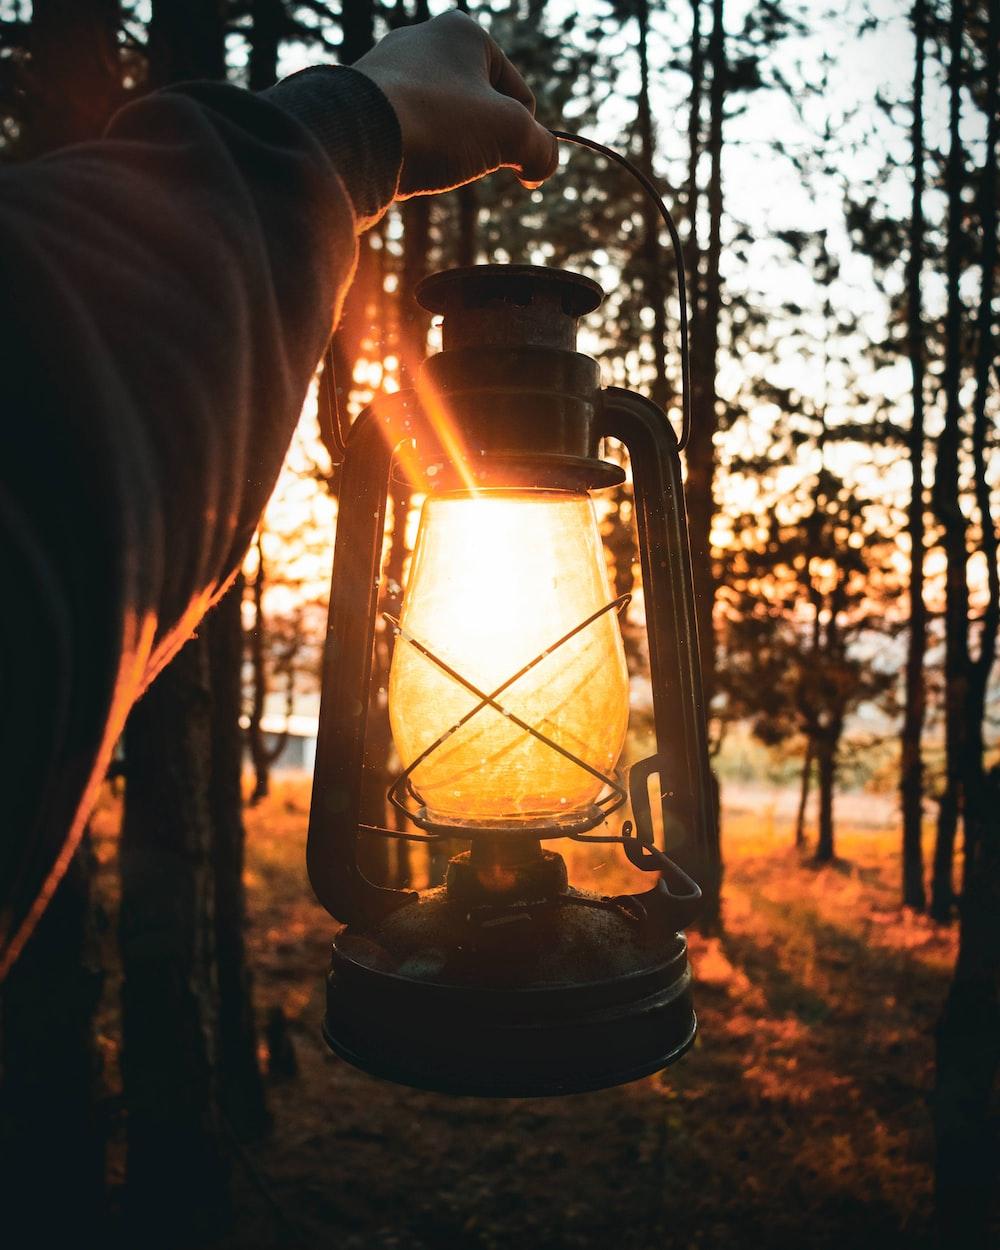 person holding lantern lamp near trees during daytime